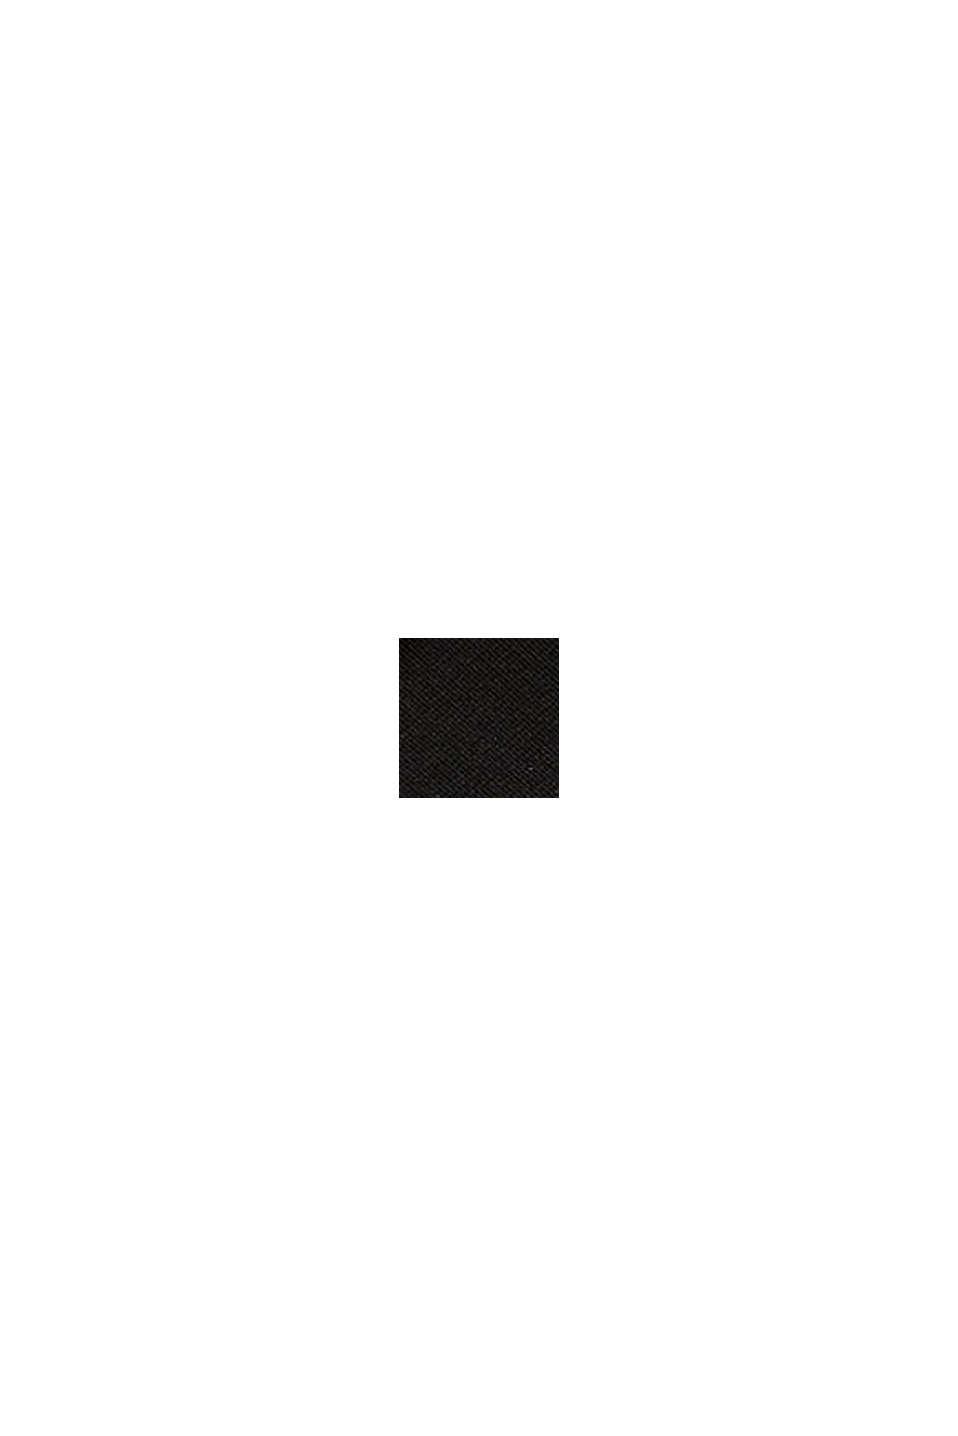 Sandali da trekking con logo, BLACK, swatch